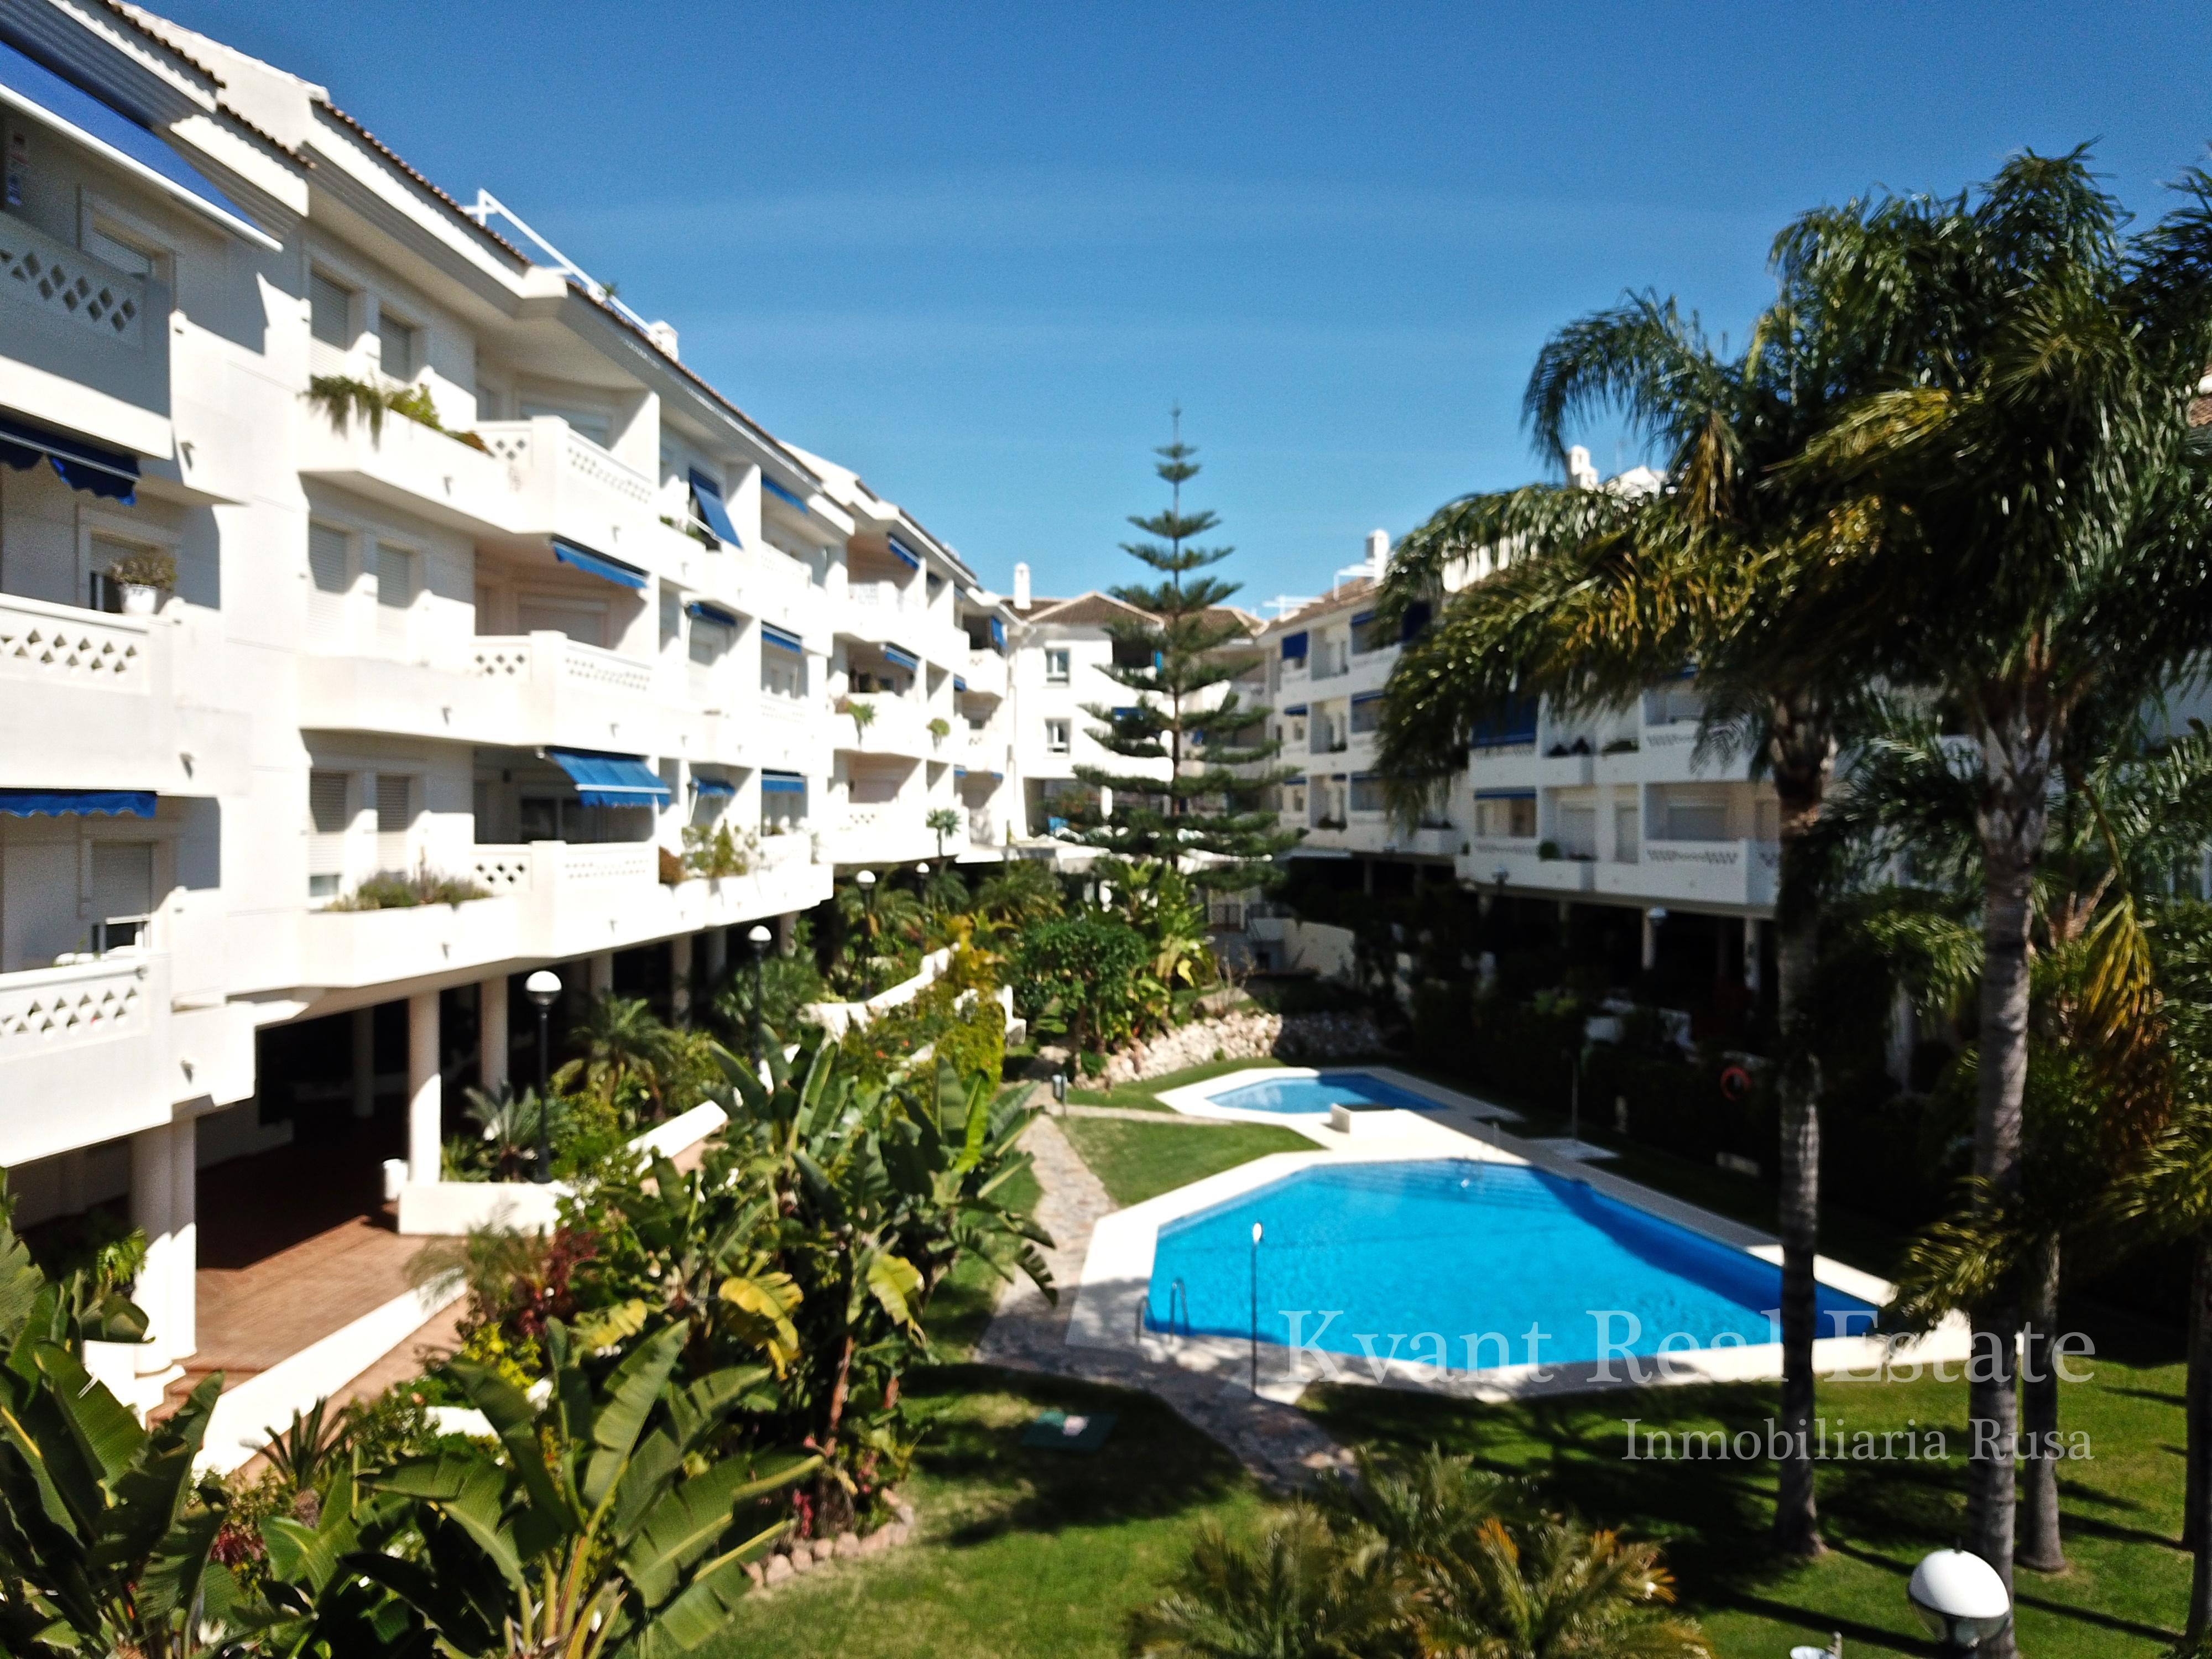 Квартира с видом на центральный бульвар в Сан Педро Алькантара